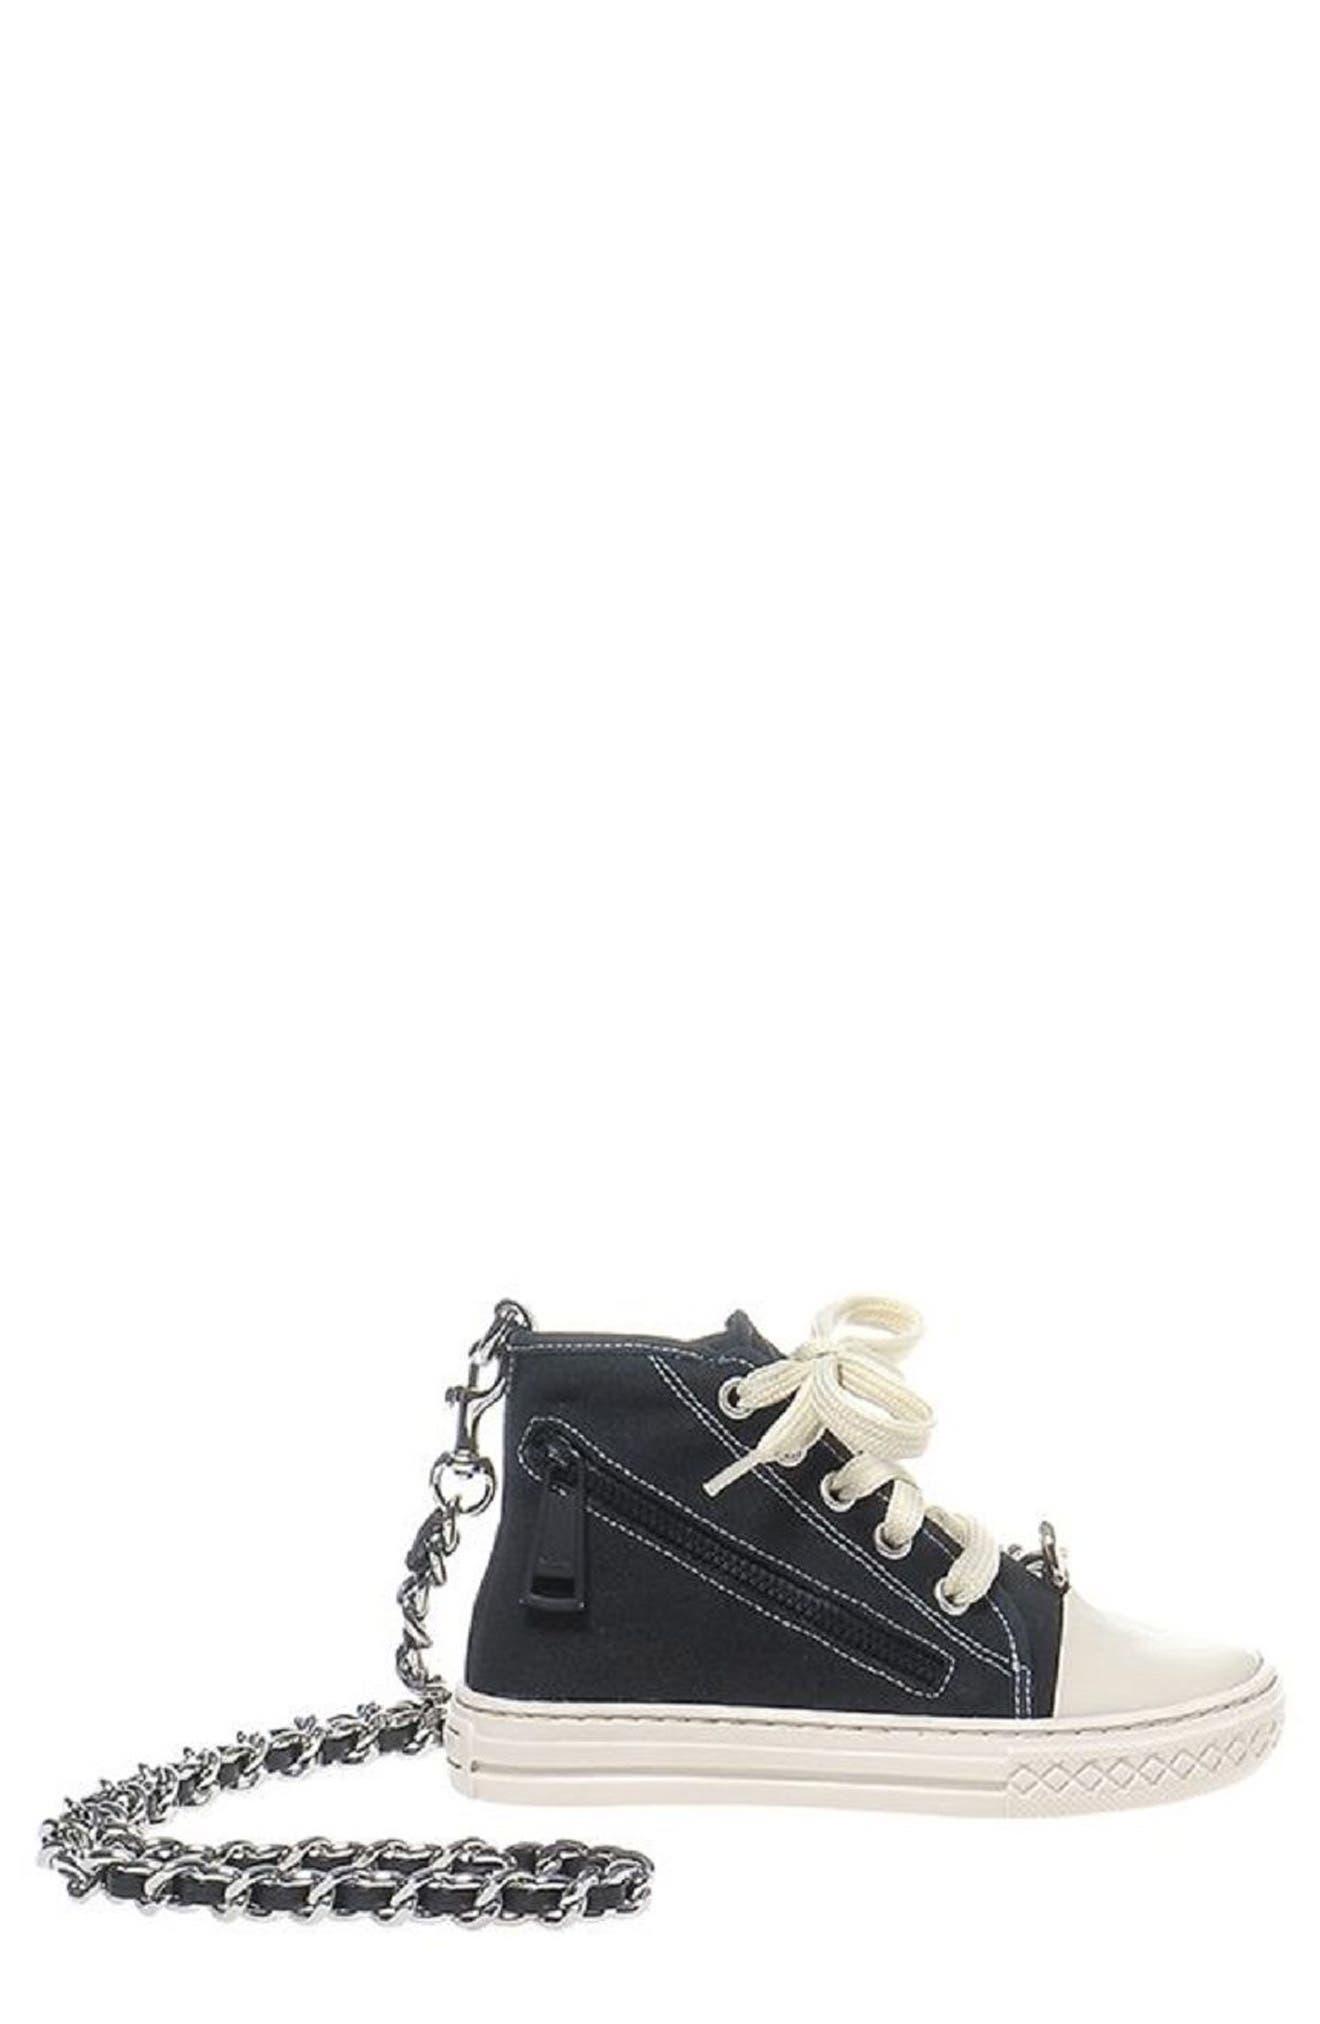 Sneaker Shoulder Bag,                             Main thumbnail 1, color,                             Black